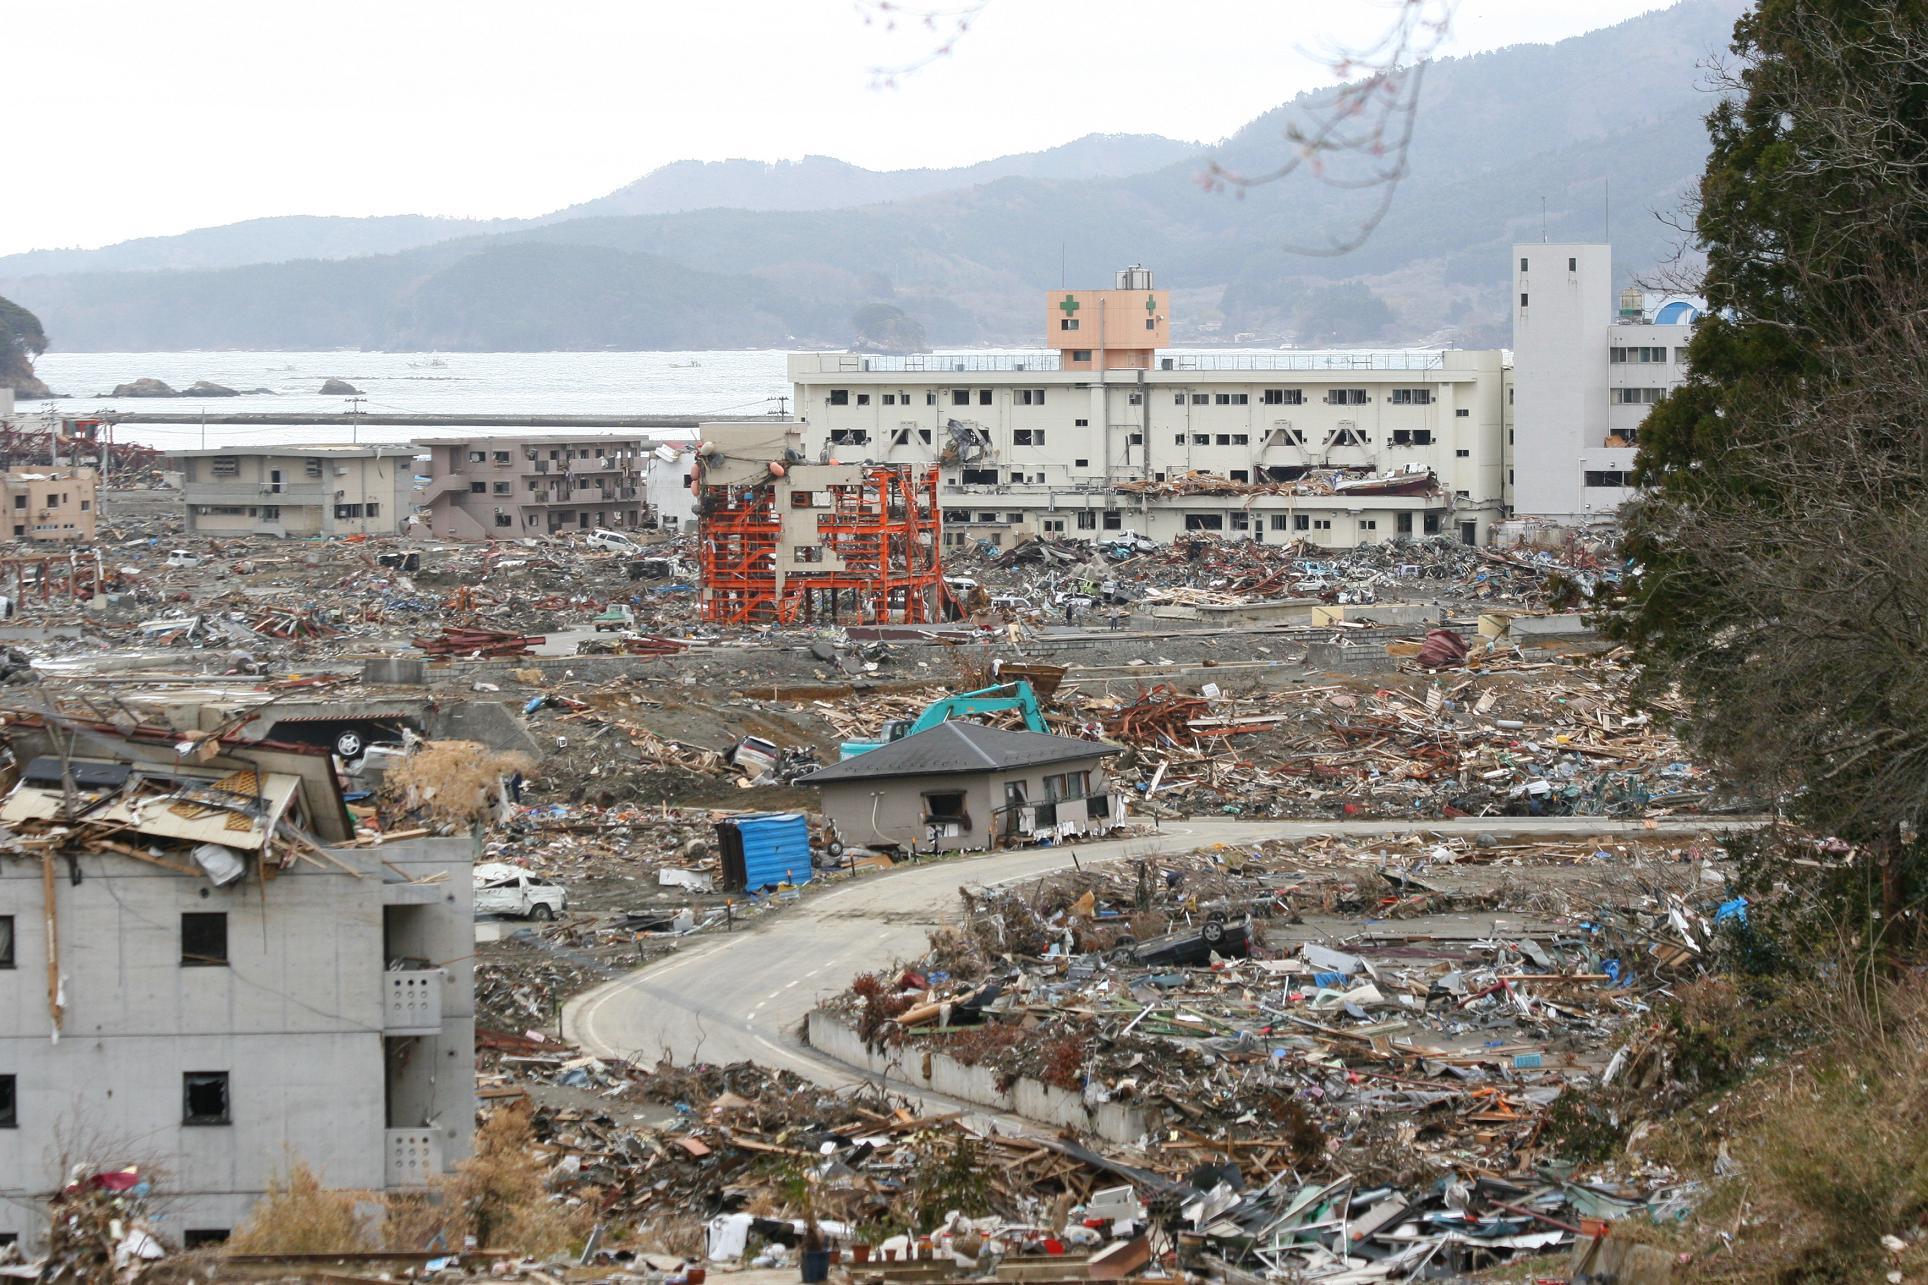 Around_Shizugawa_Public_Hospital_in_Minamisanriku_after_tsunami_2.jpg